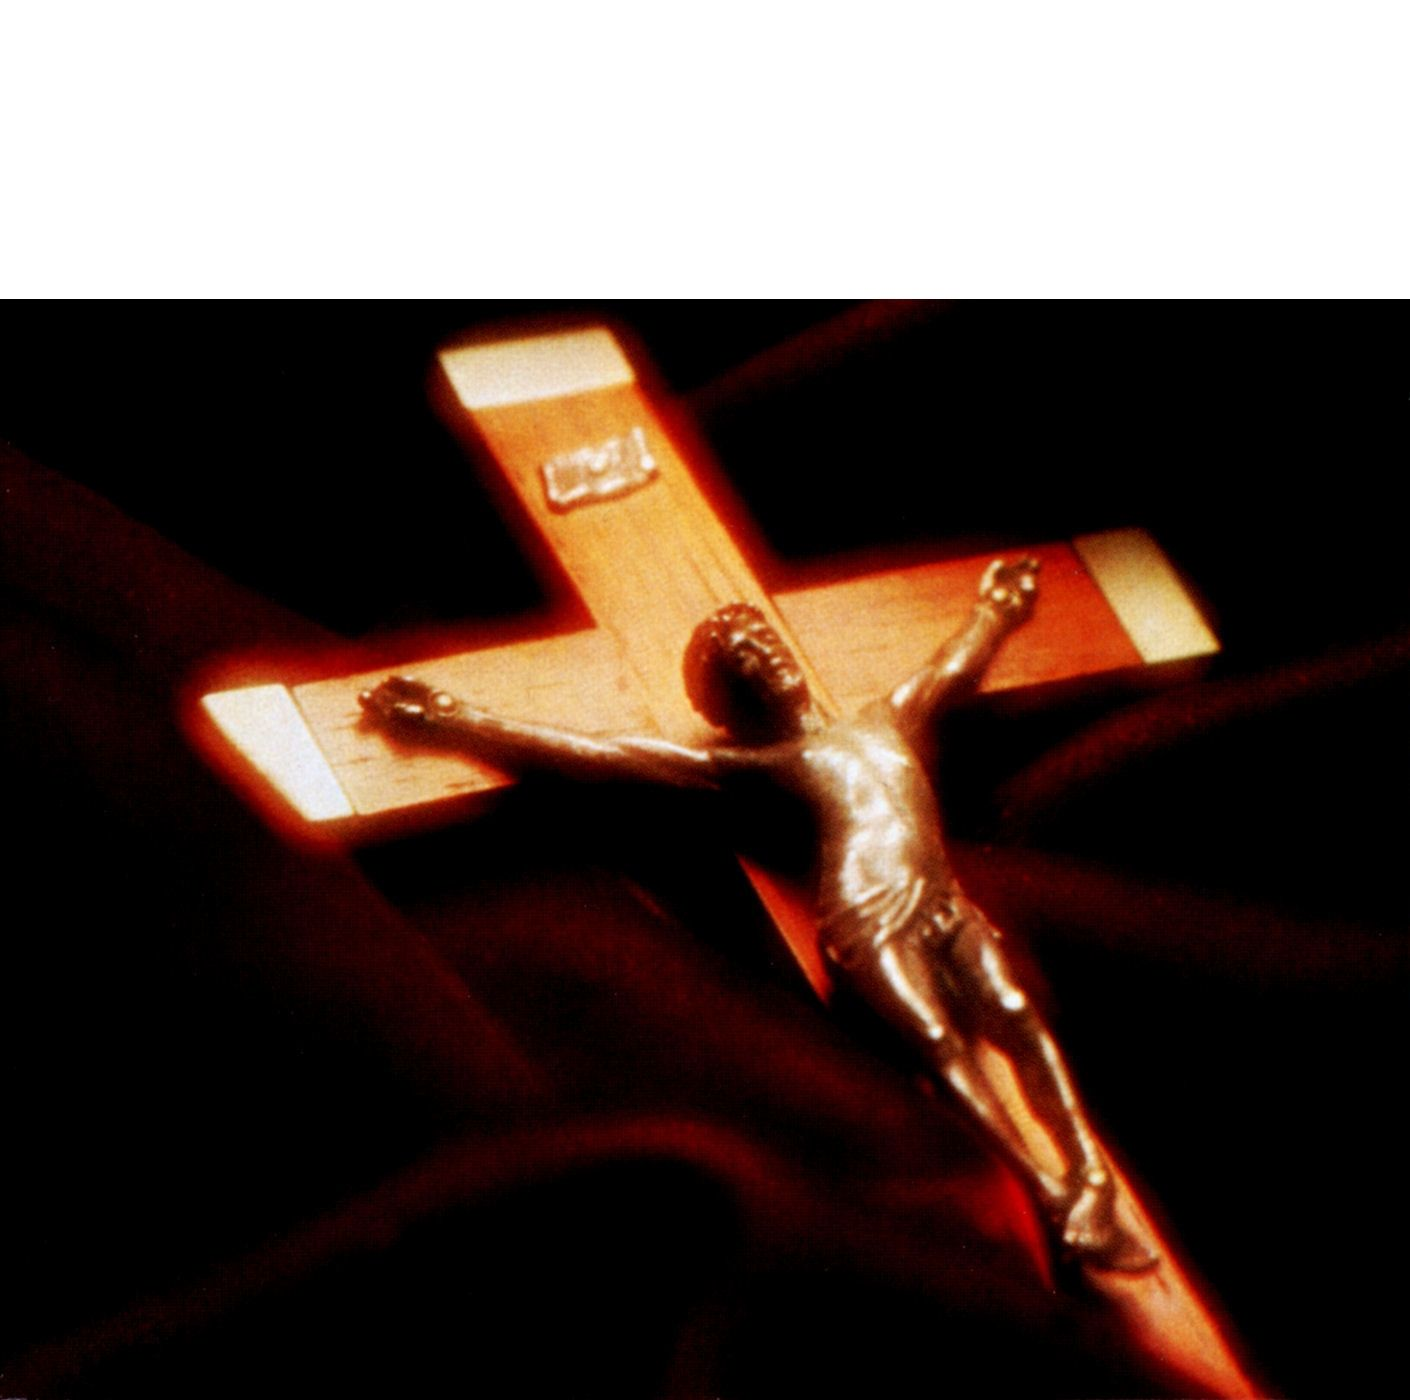 Allegri, Gregorio: Celebre MISERERE MEI DEUS